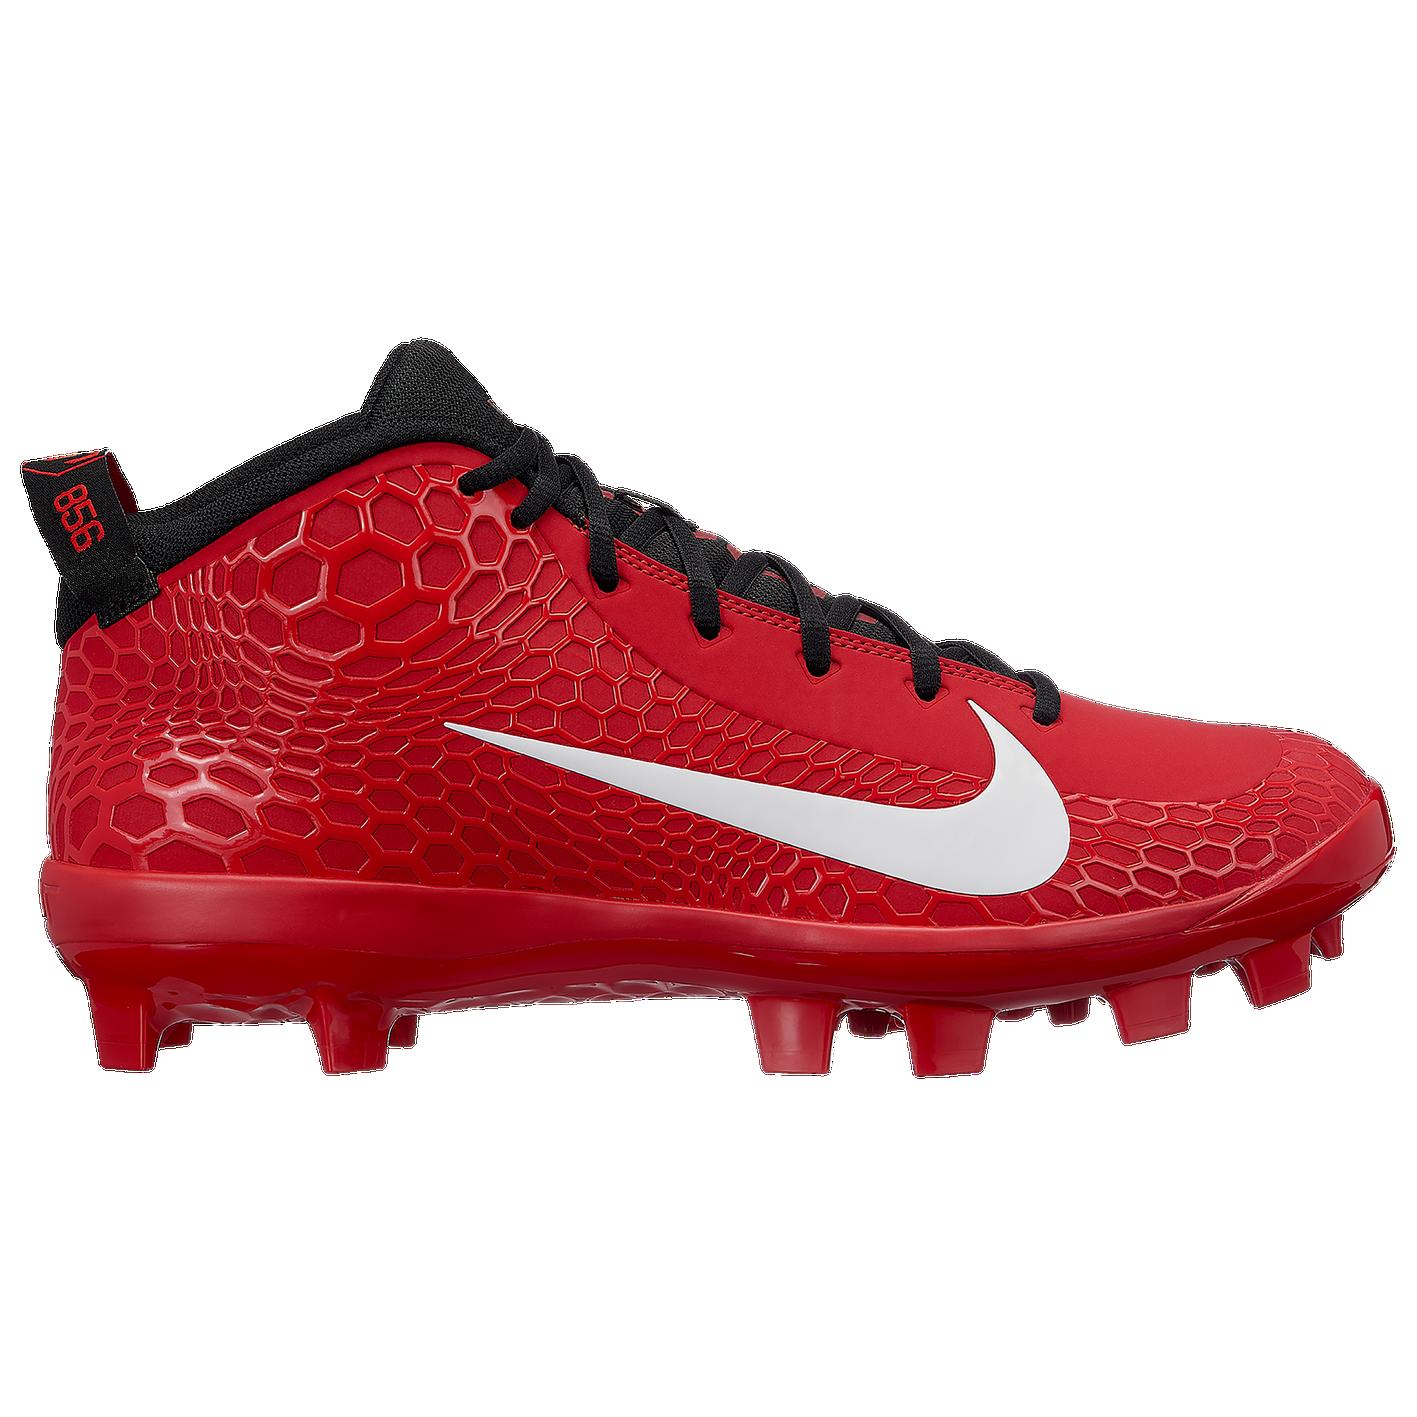 new concept 6be89 0378b Nike Force Zoom Trout 5 Pro - Men's - Baseball - Shoes - University ...